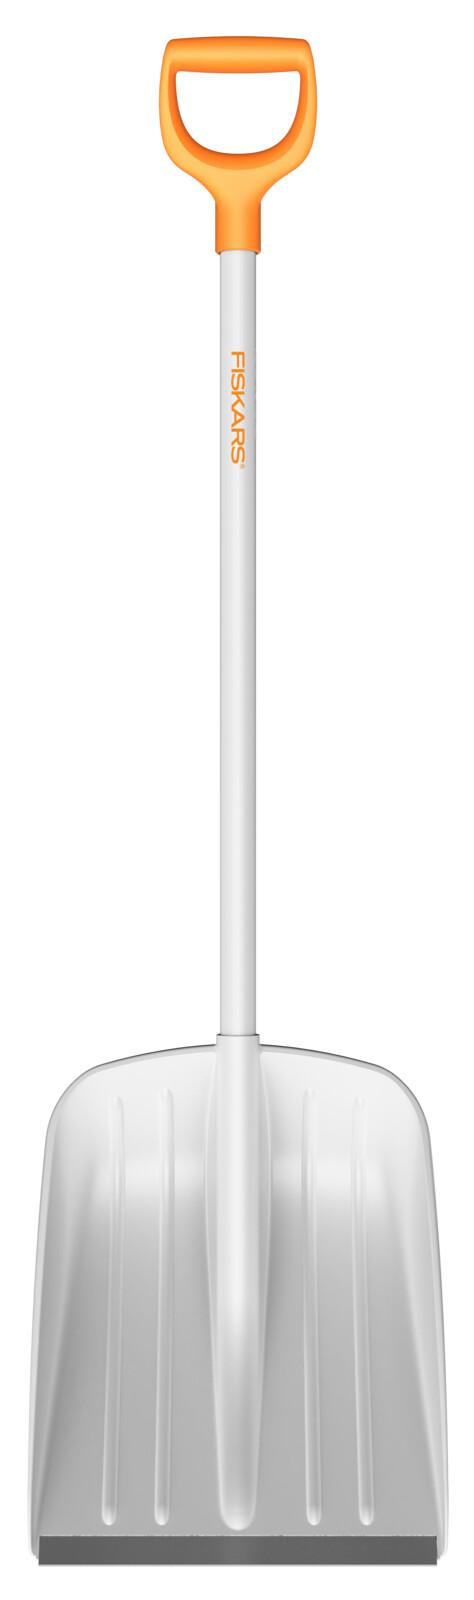 Fiskars Лопата для уборки снега белая SnowXpert, 131 см, 1400г